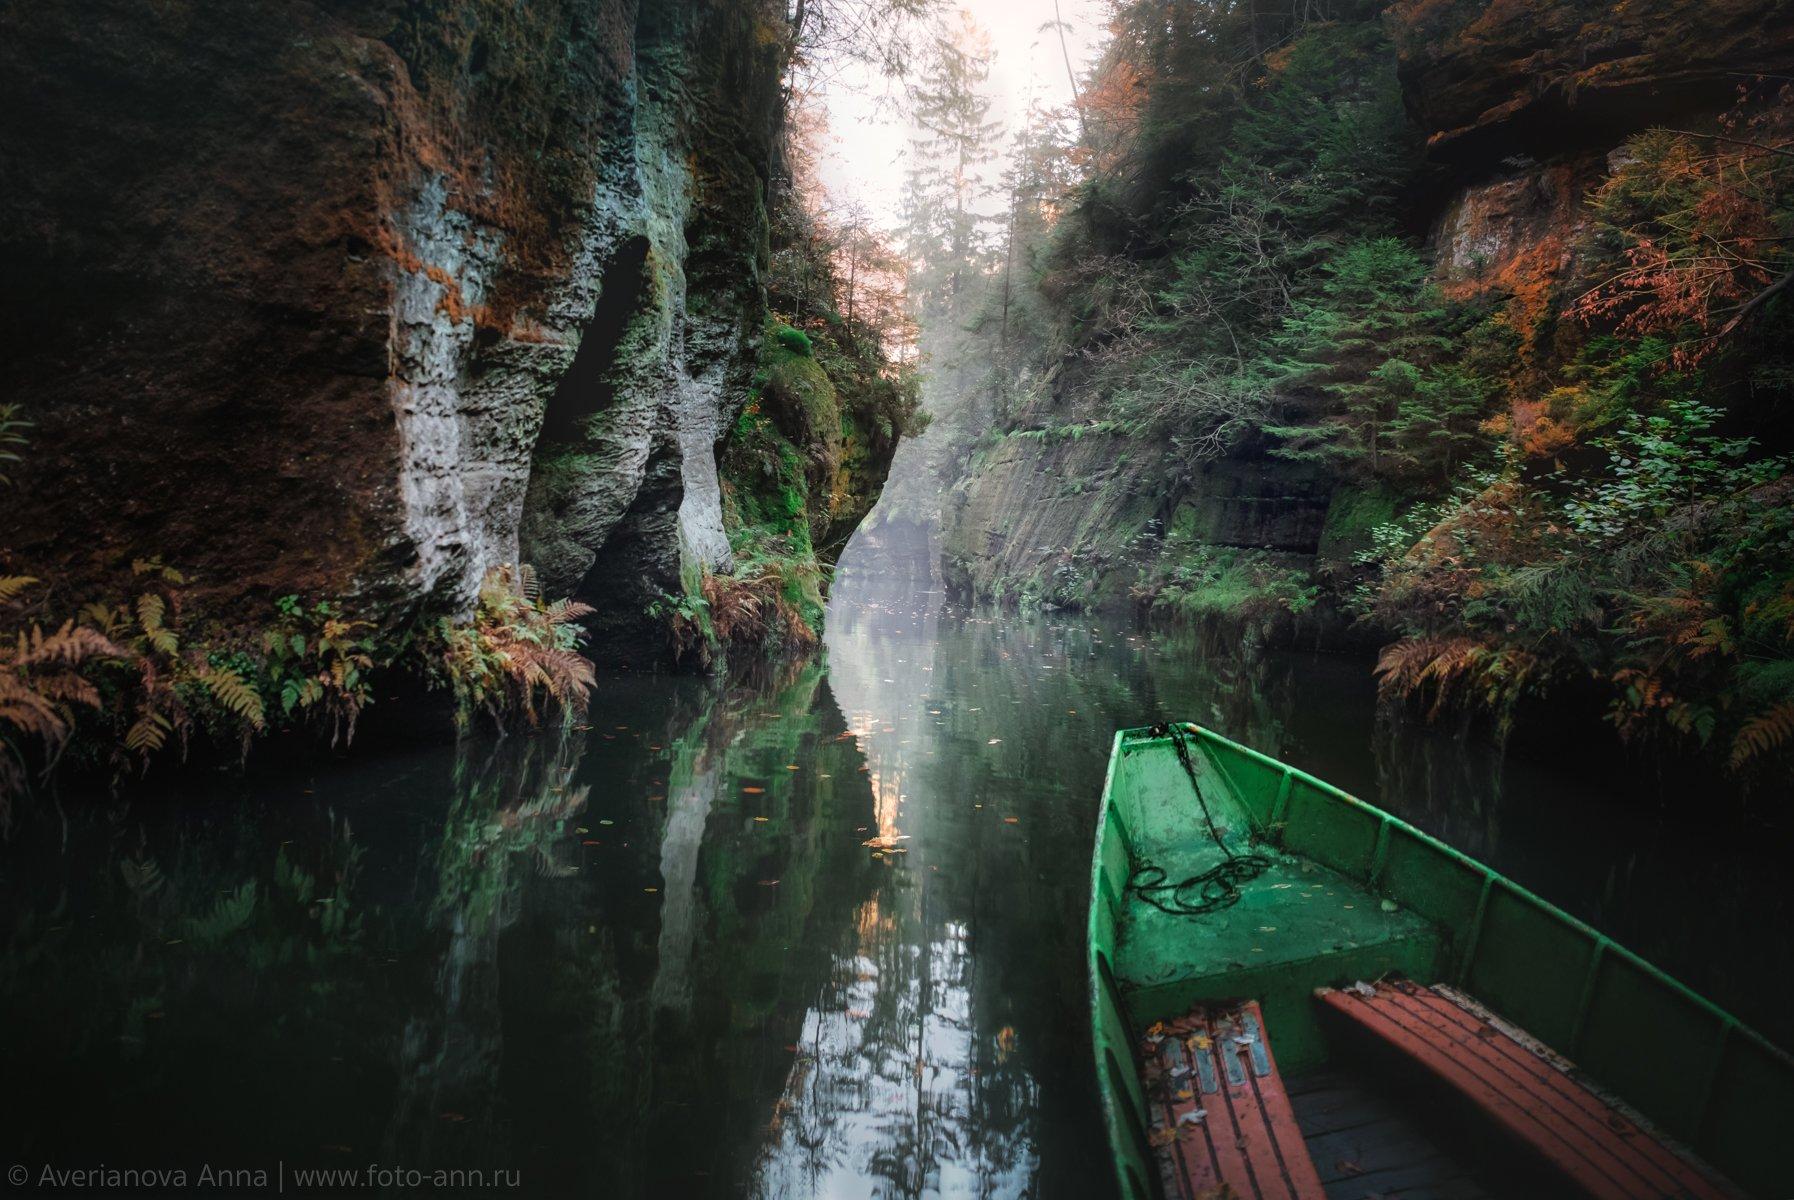 лодка, природа, скалы, Анна Аверьянова